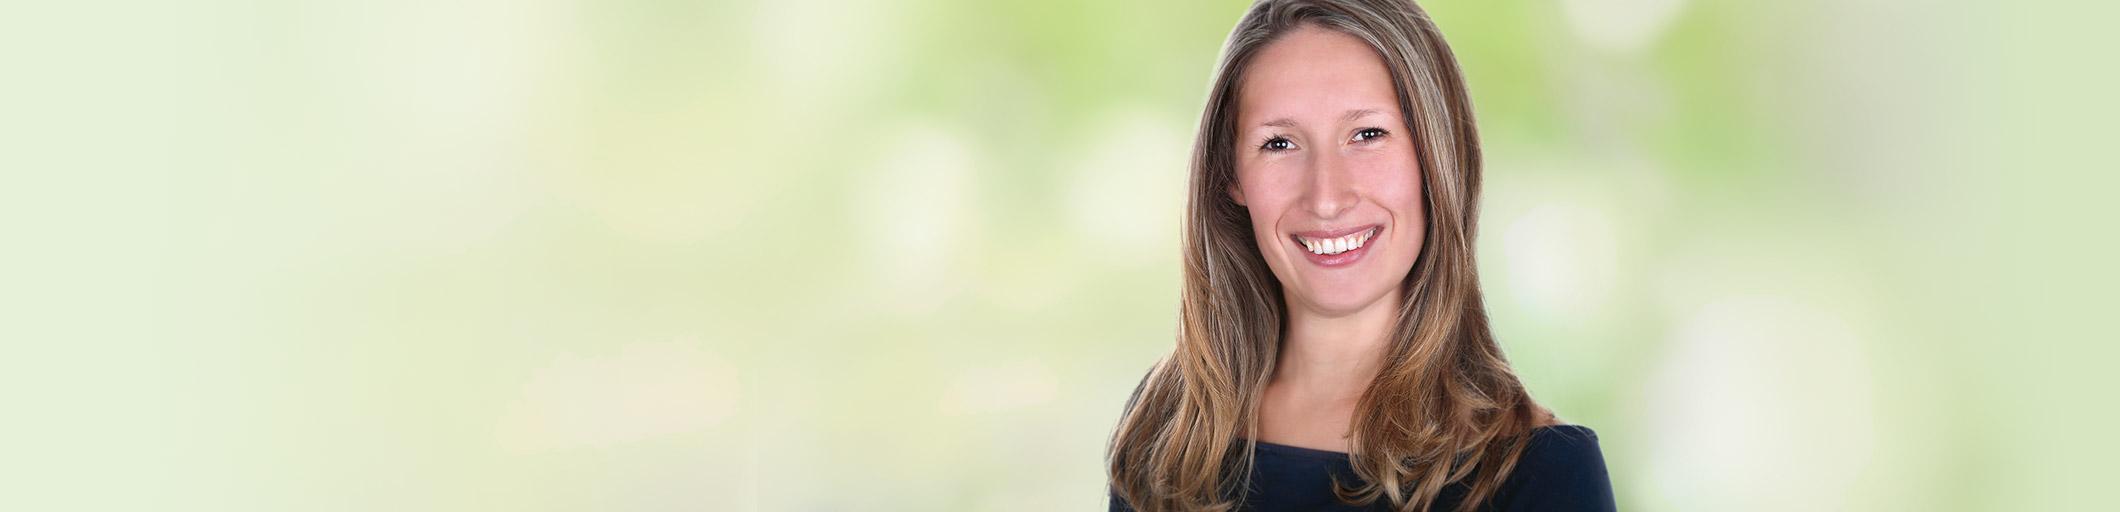 Alina Pees, Heilpraktiker in Eppelheim